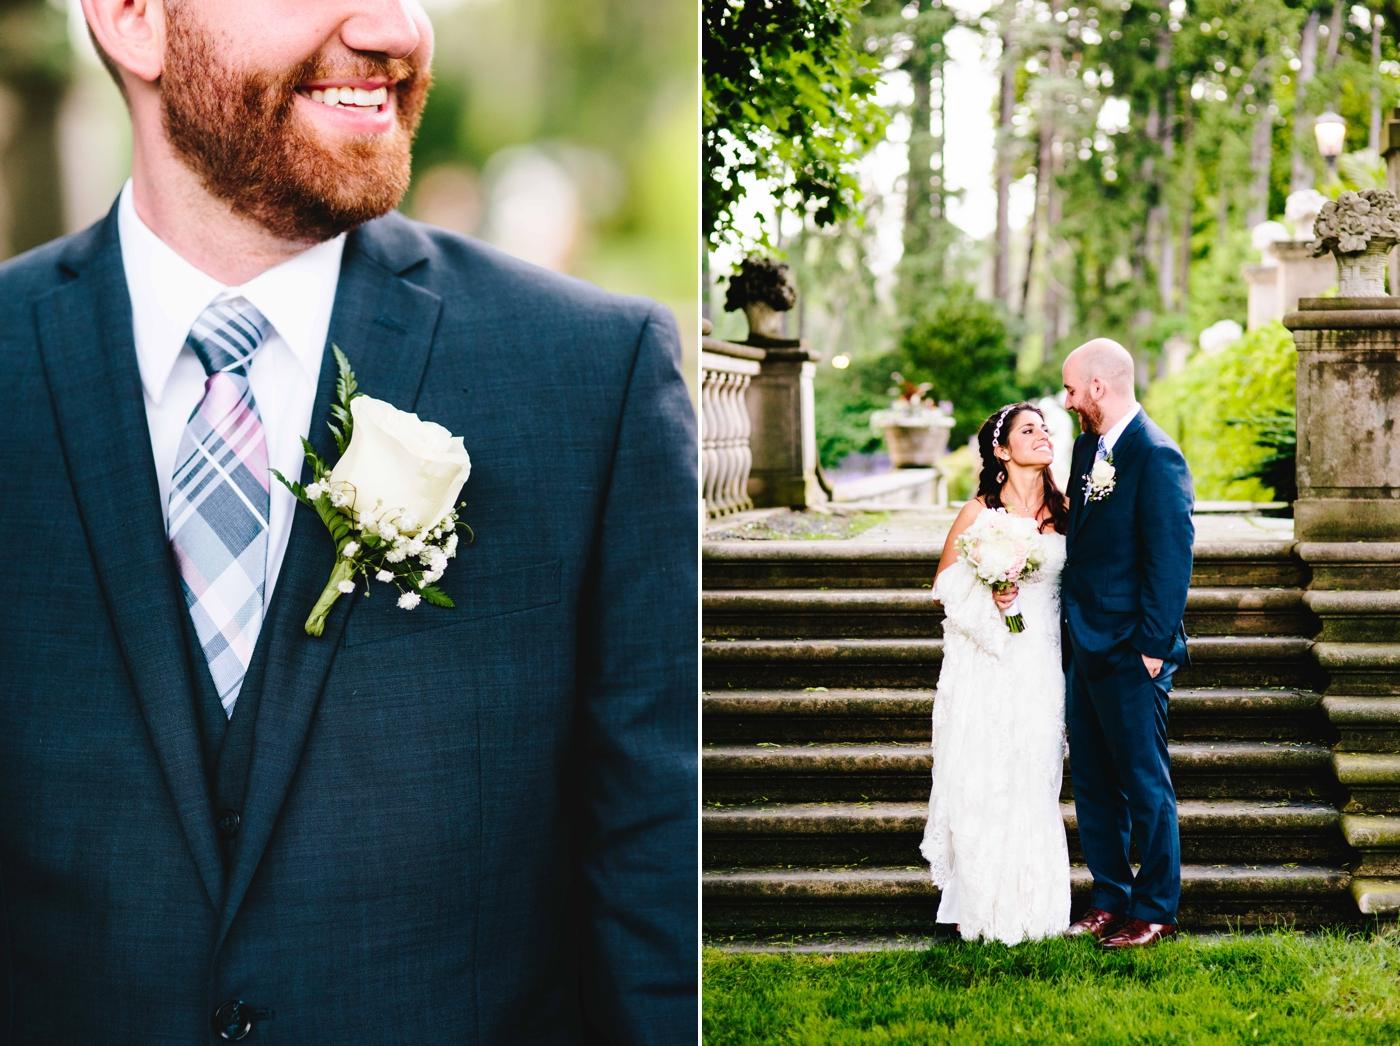 chicago-fine-art-wedding-photography-svihra6